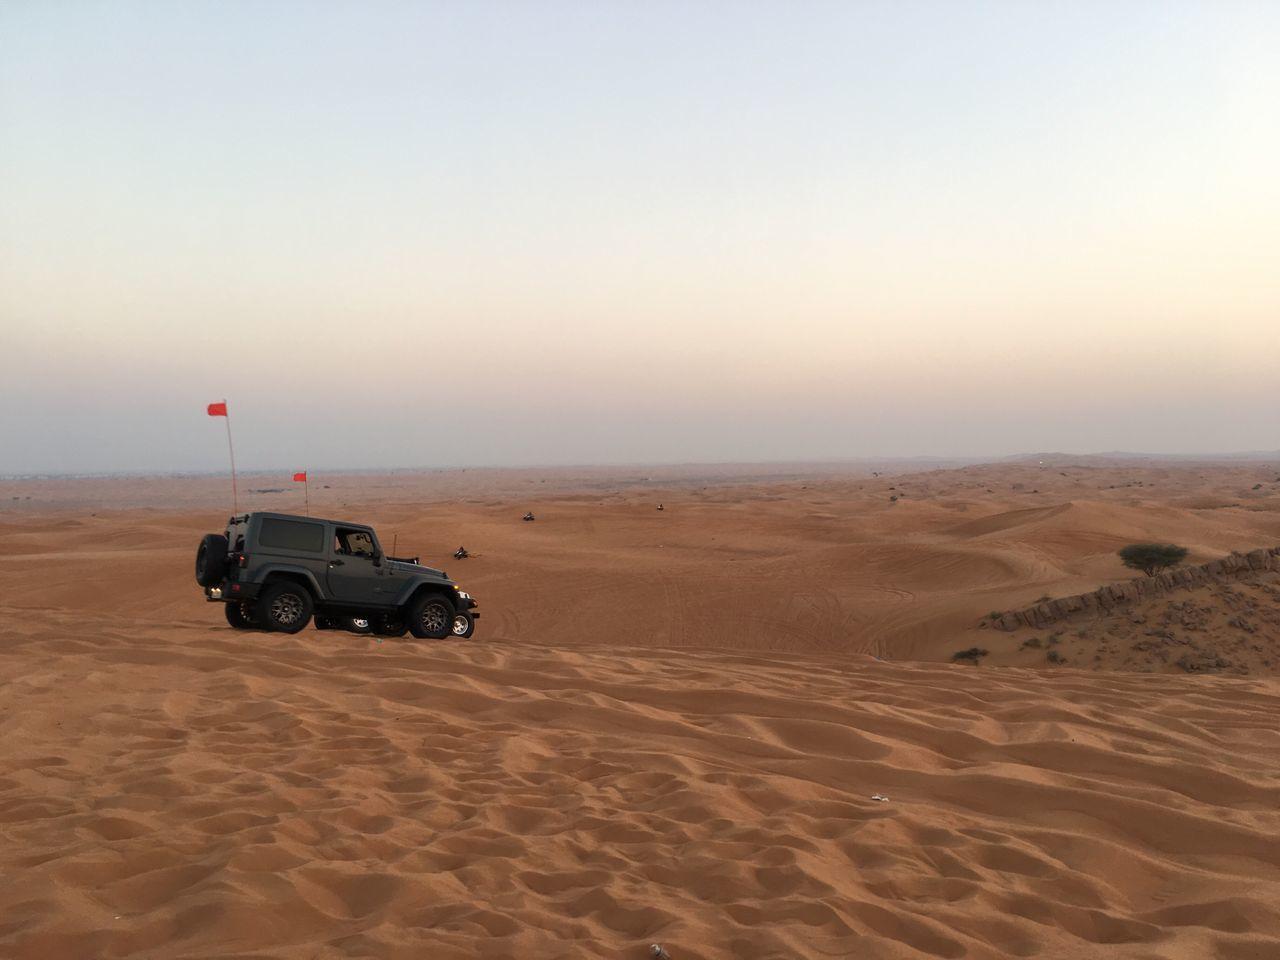 Dubai Sand Desert Sand Dune Arid Climate Car Off-road Vehicle Nature Outdoors Sunset Scenics Extreme Terrain Sky No People Beach Day